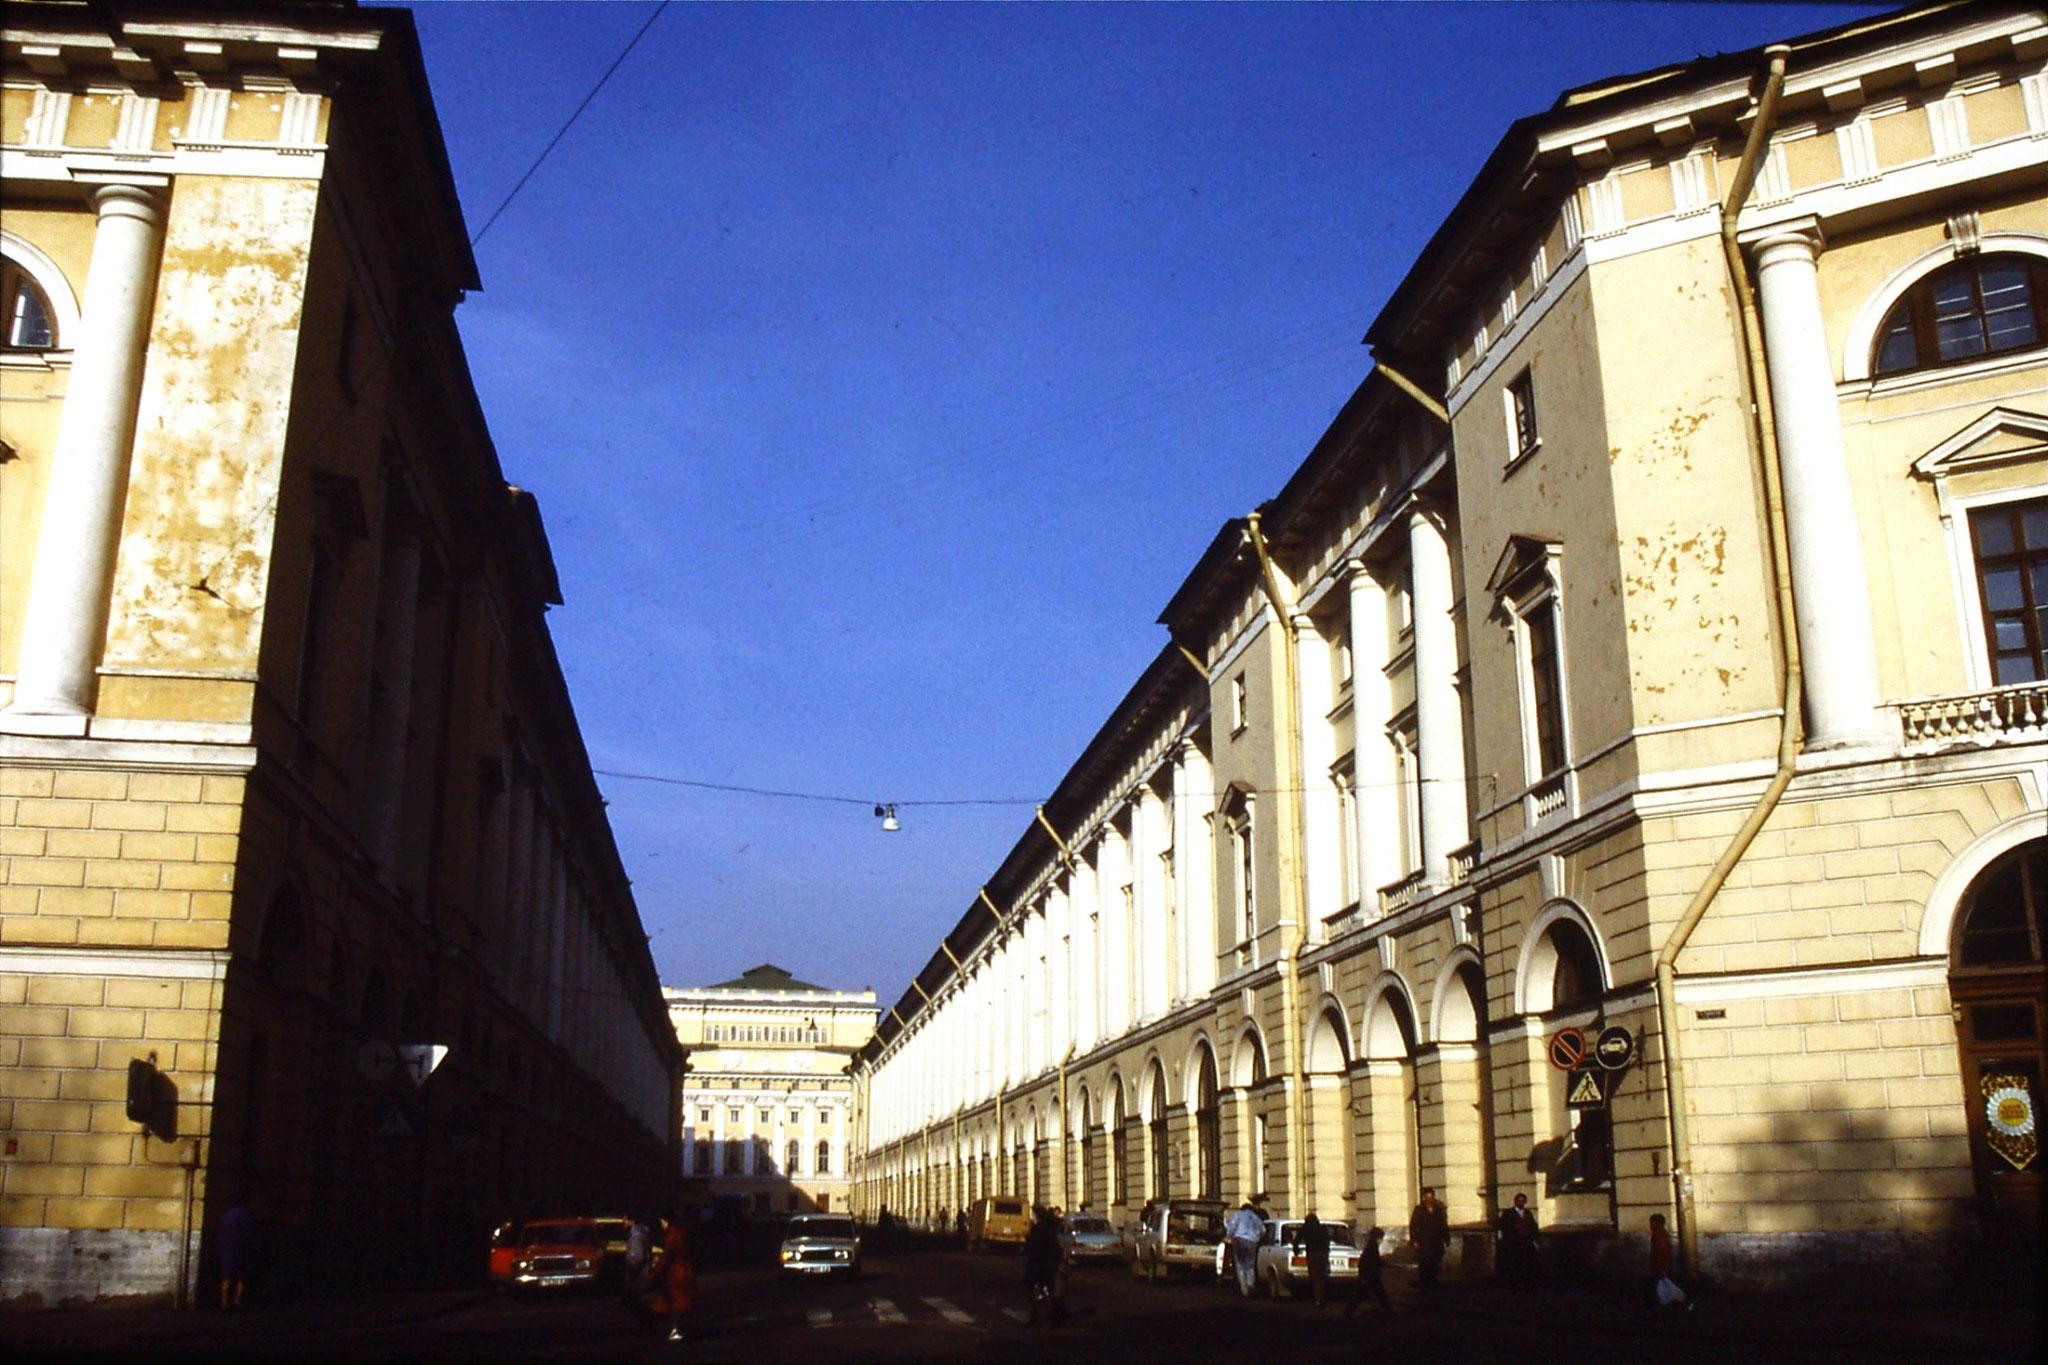 15/10/1988: 2: Theatre Street & Pushkin Theatre